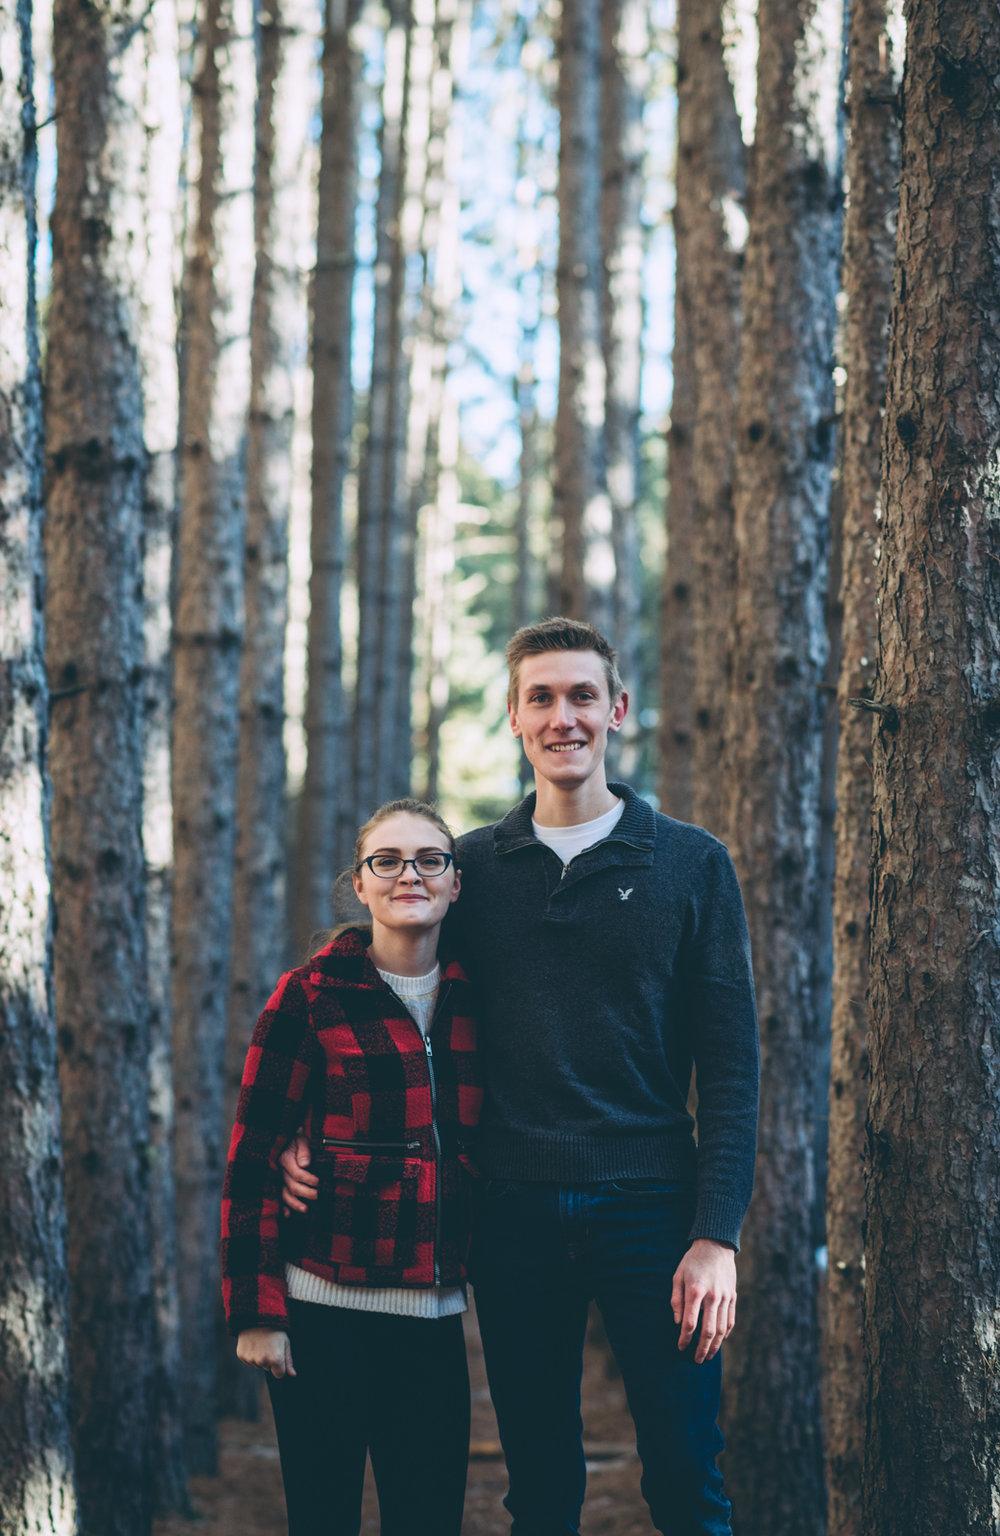 alex-portraits-treefarm-blog-6.jpg